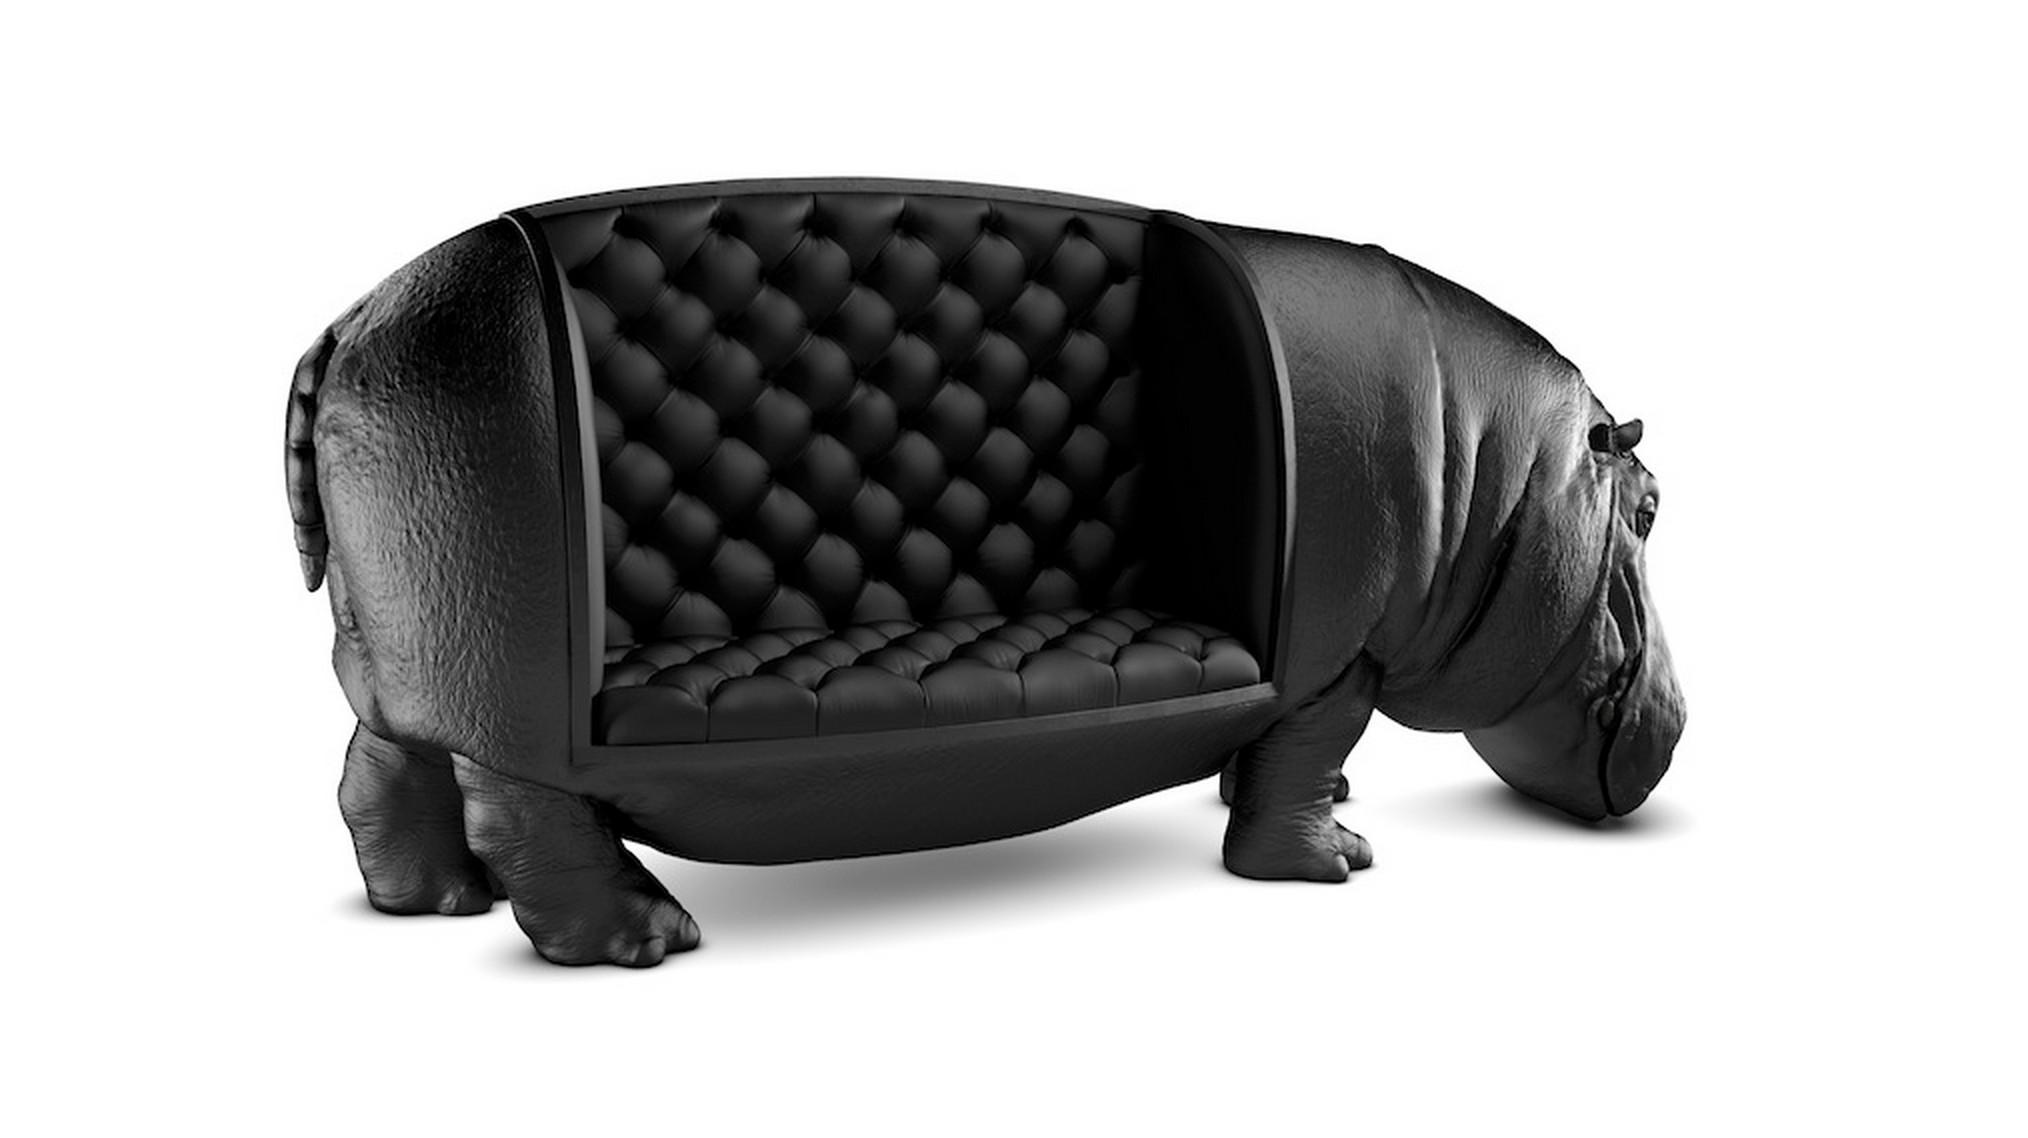 canape hippopotame 3 blog d co design. Black Bedroom Furniture Sets. Home Design Ideas